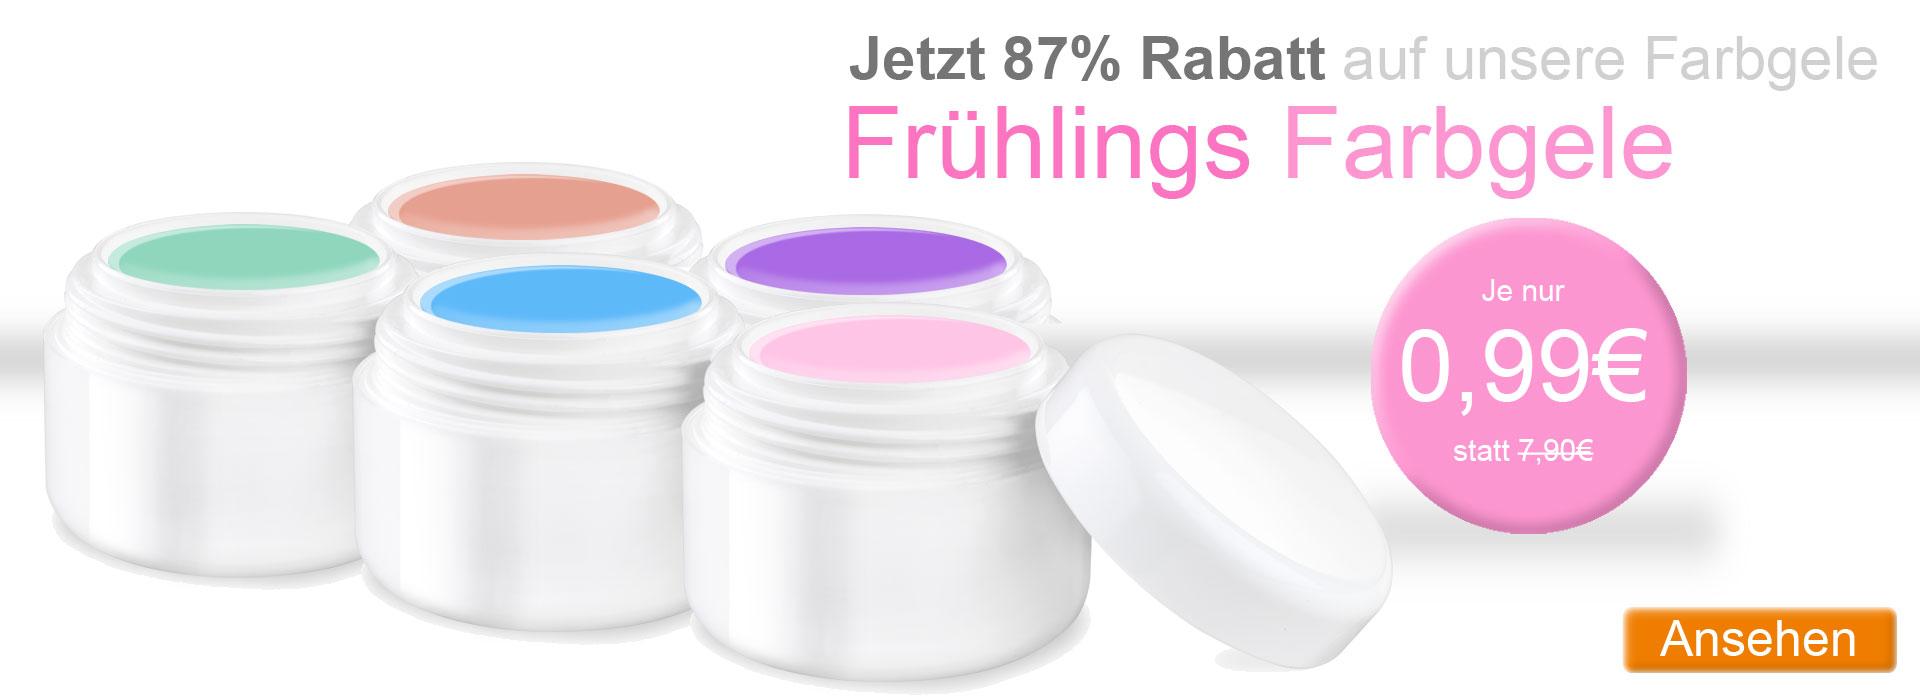 Farbgel Frühlingsfarben günstig kaufen ab 0,99 Cent